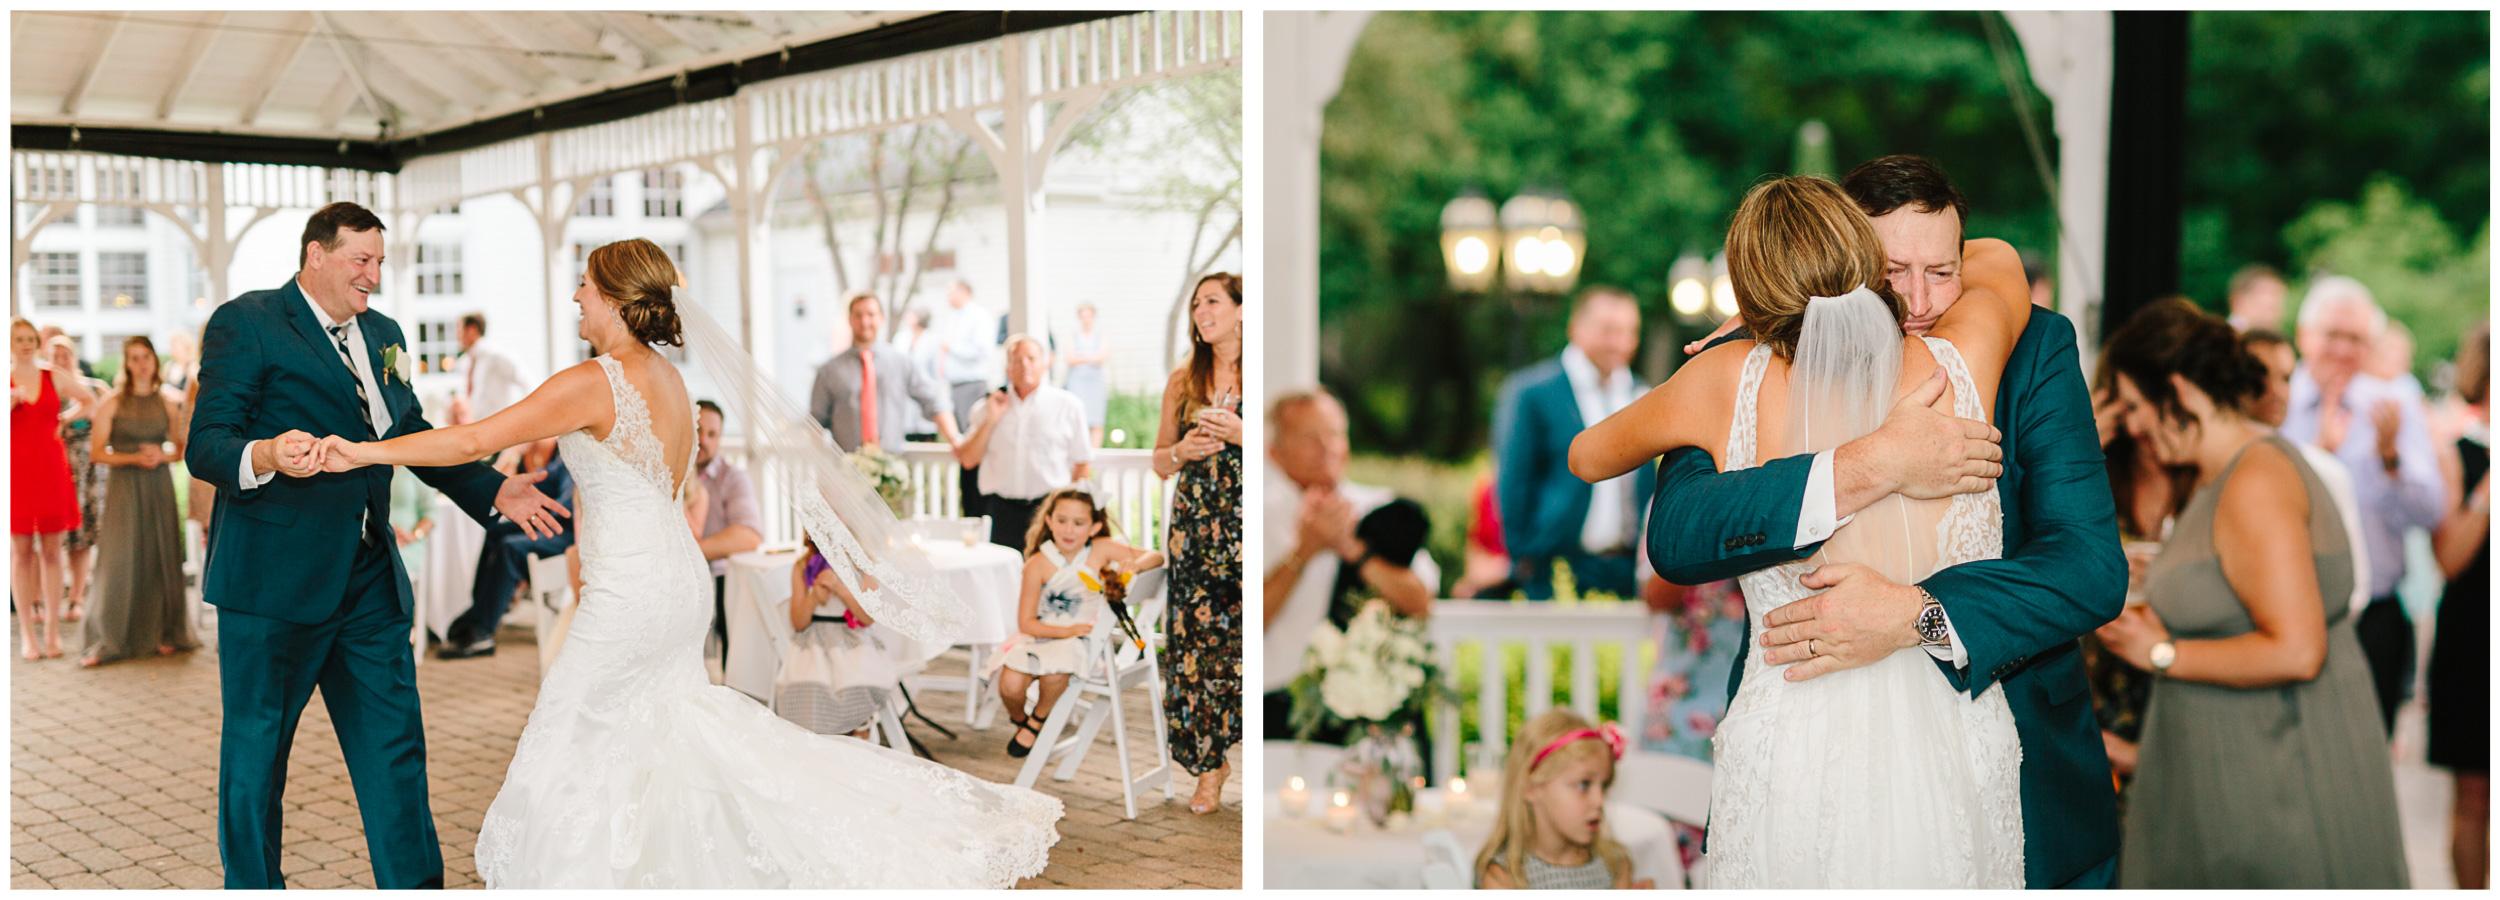 ann_arbor_michigan_wedding_92.jpg